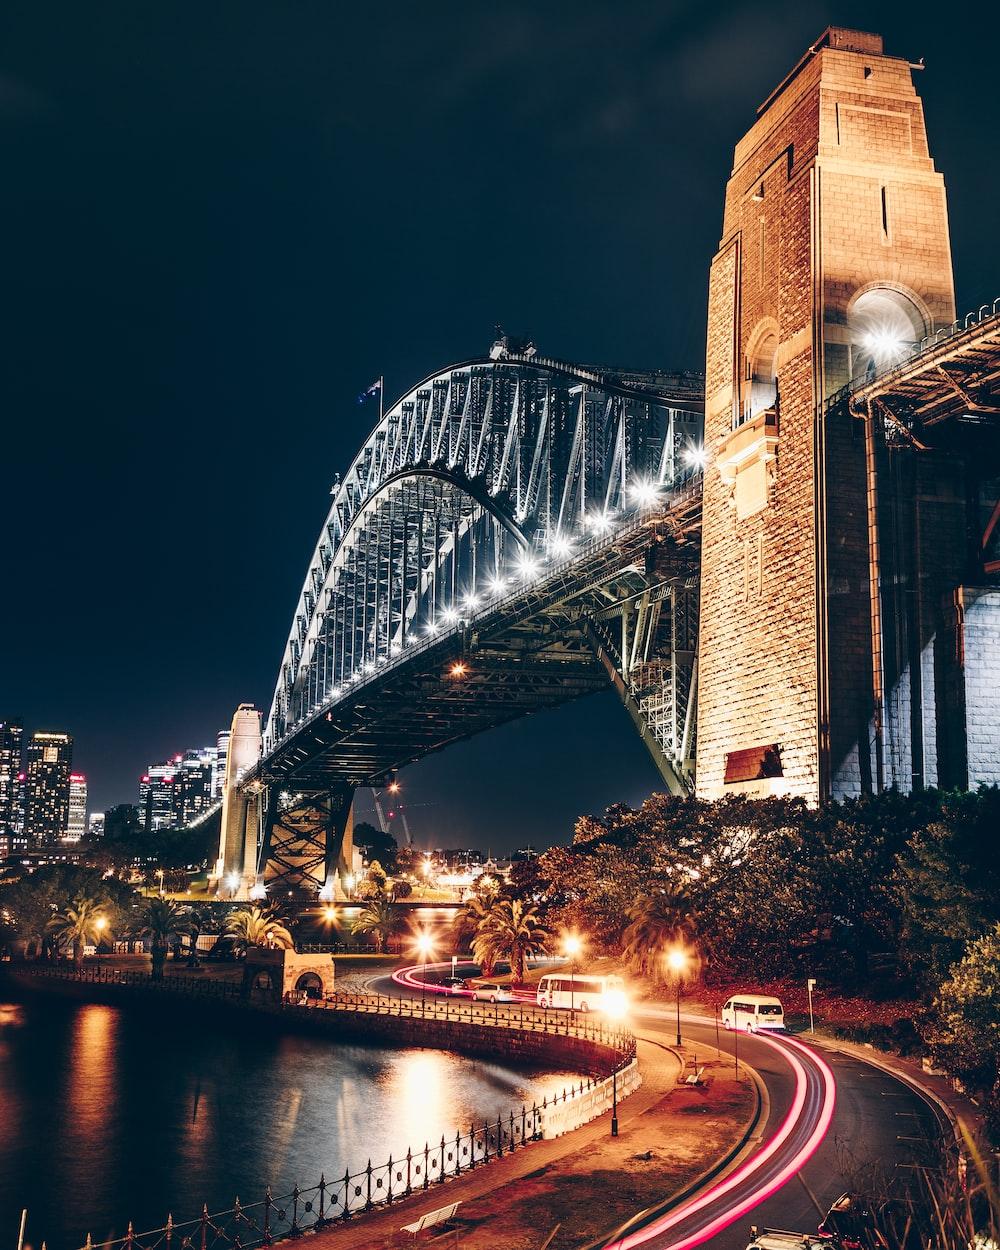 black and brown concrete bridge during night time